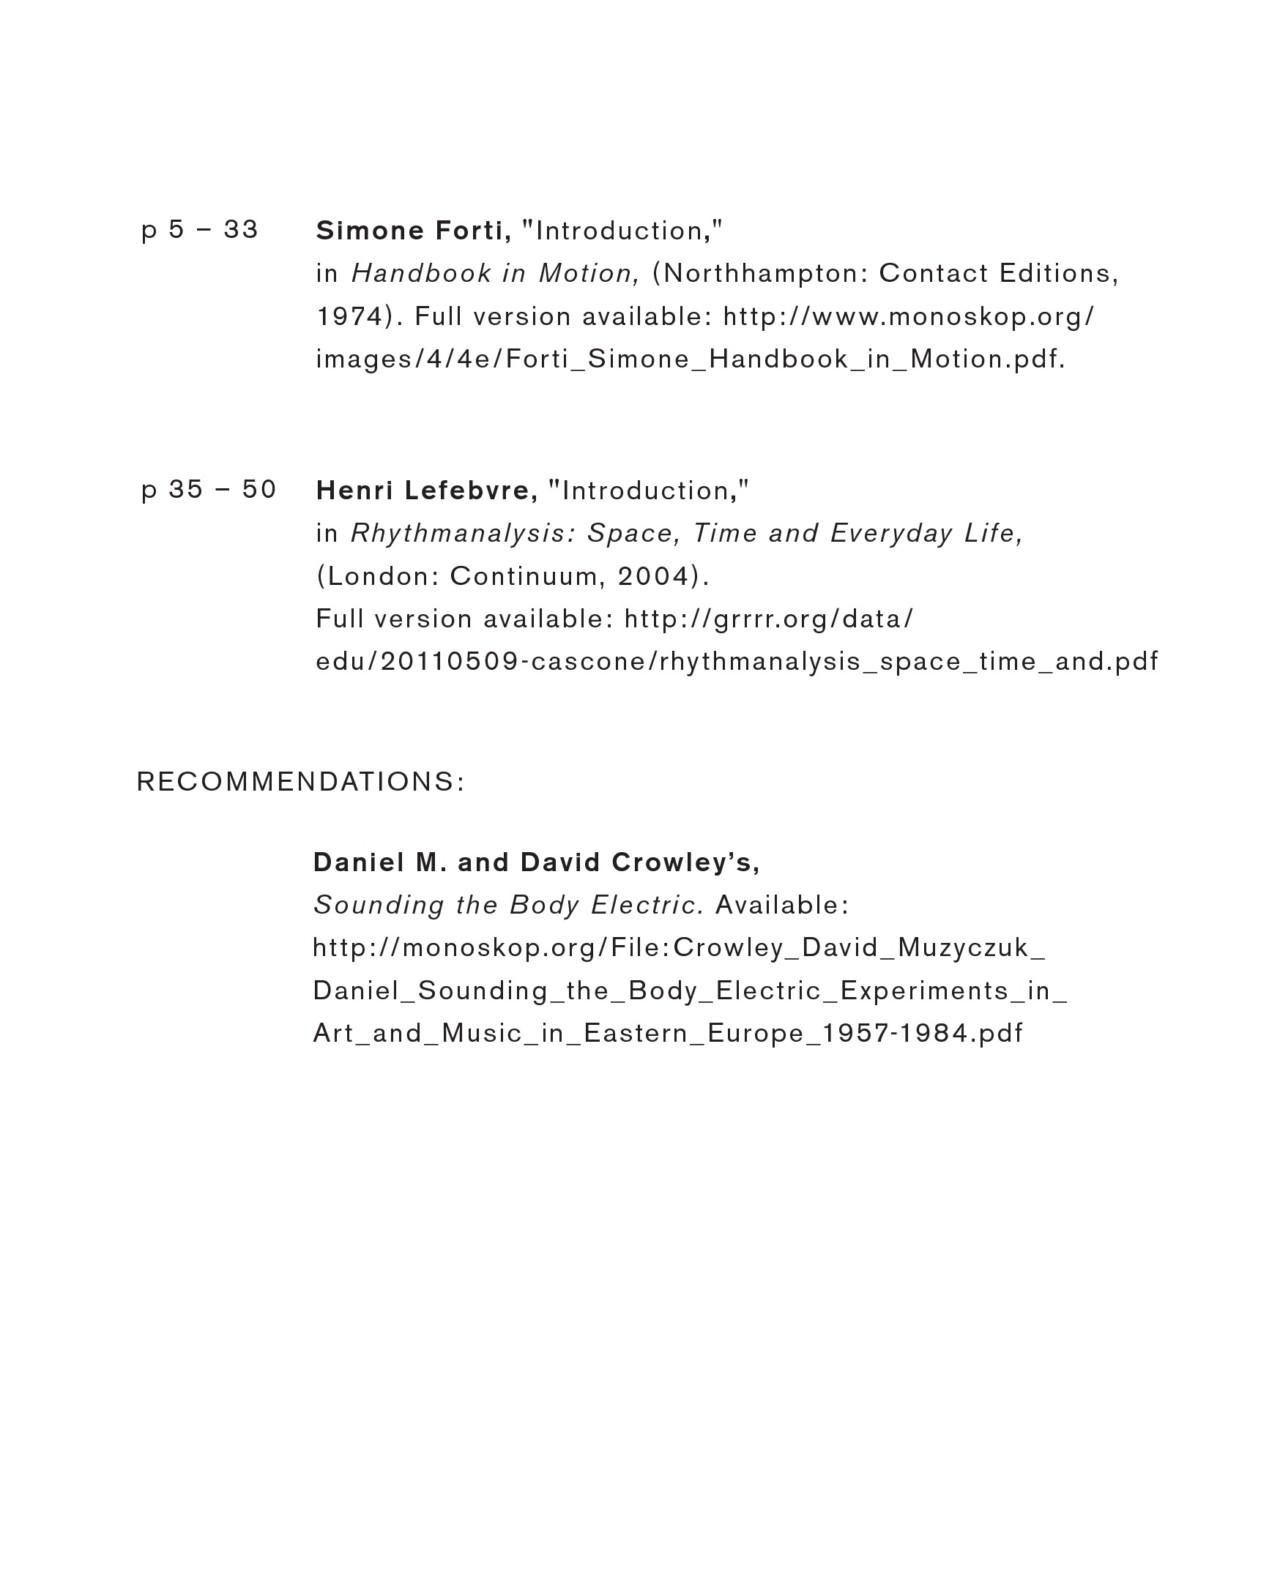 Membrane d14 SESSIONS #7 Natasha Ginwala, Curatorial Advisor, d14